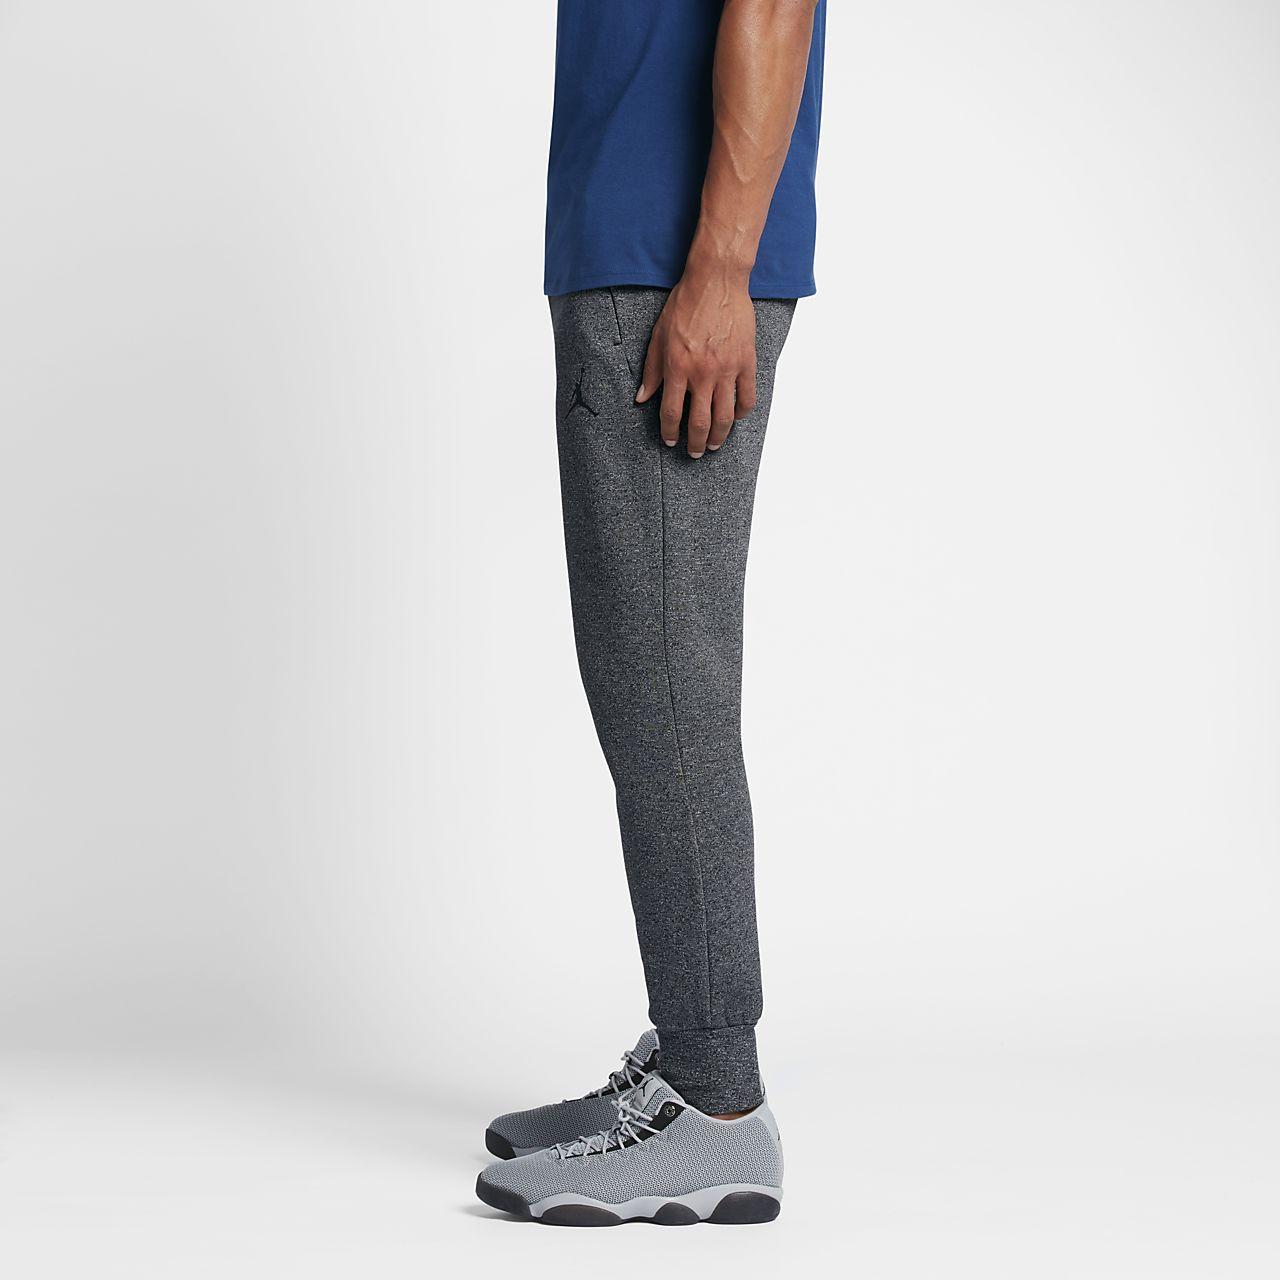 ca65b54490bd Jordan Icon Fleece Cuffed Men s Sweatpants. Nike.com BG